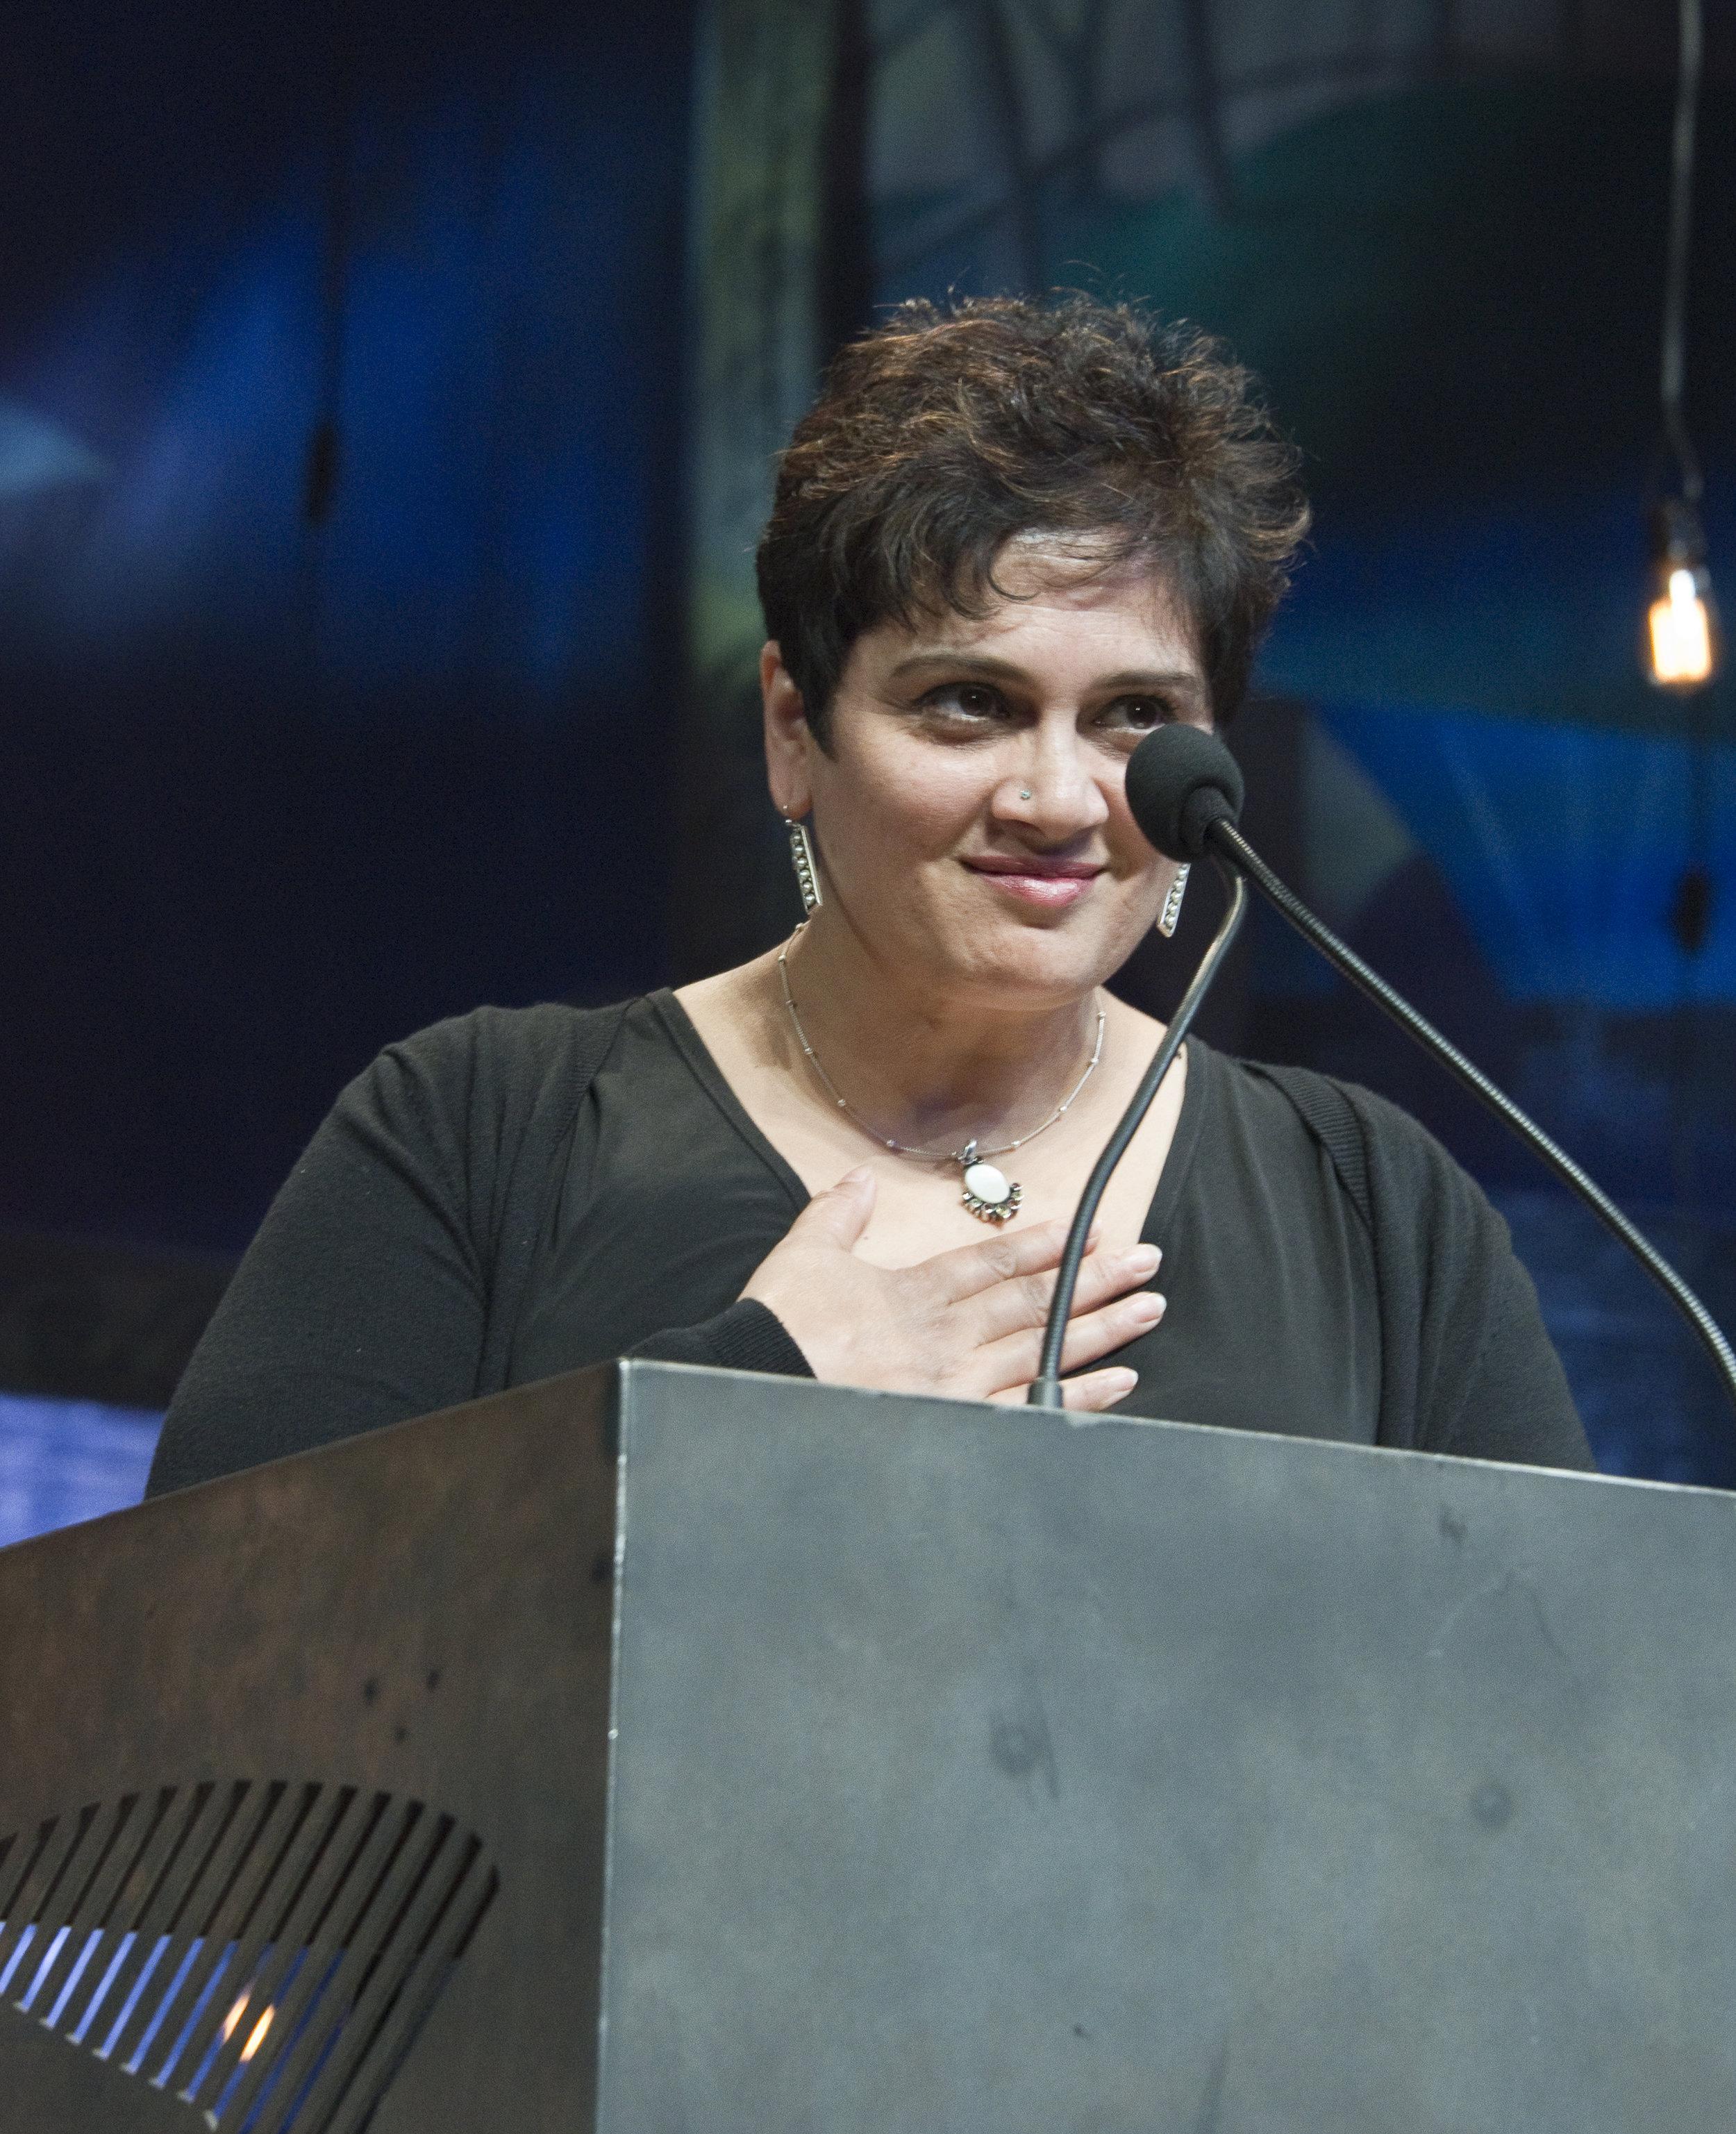 AP Awards Night stage Anila Quayyum Agha speech speaks winner public vote grand prize Theatre 2014_1.jpg